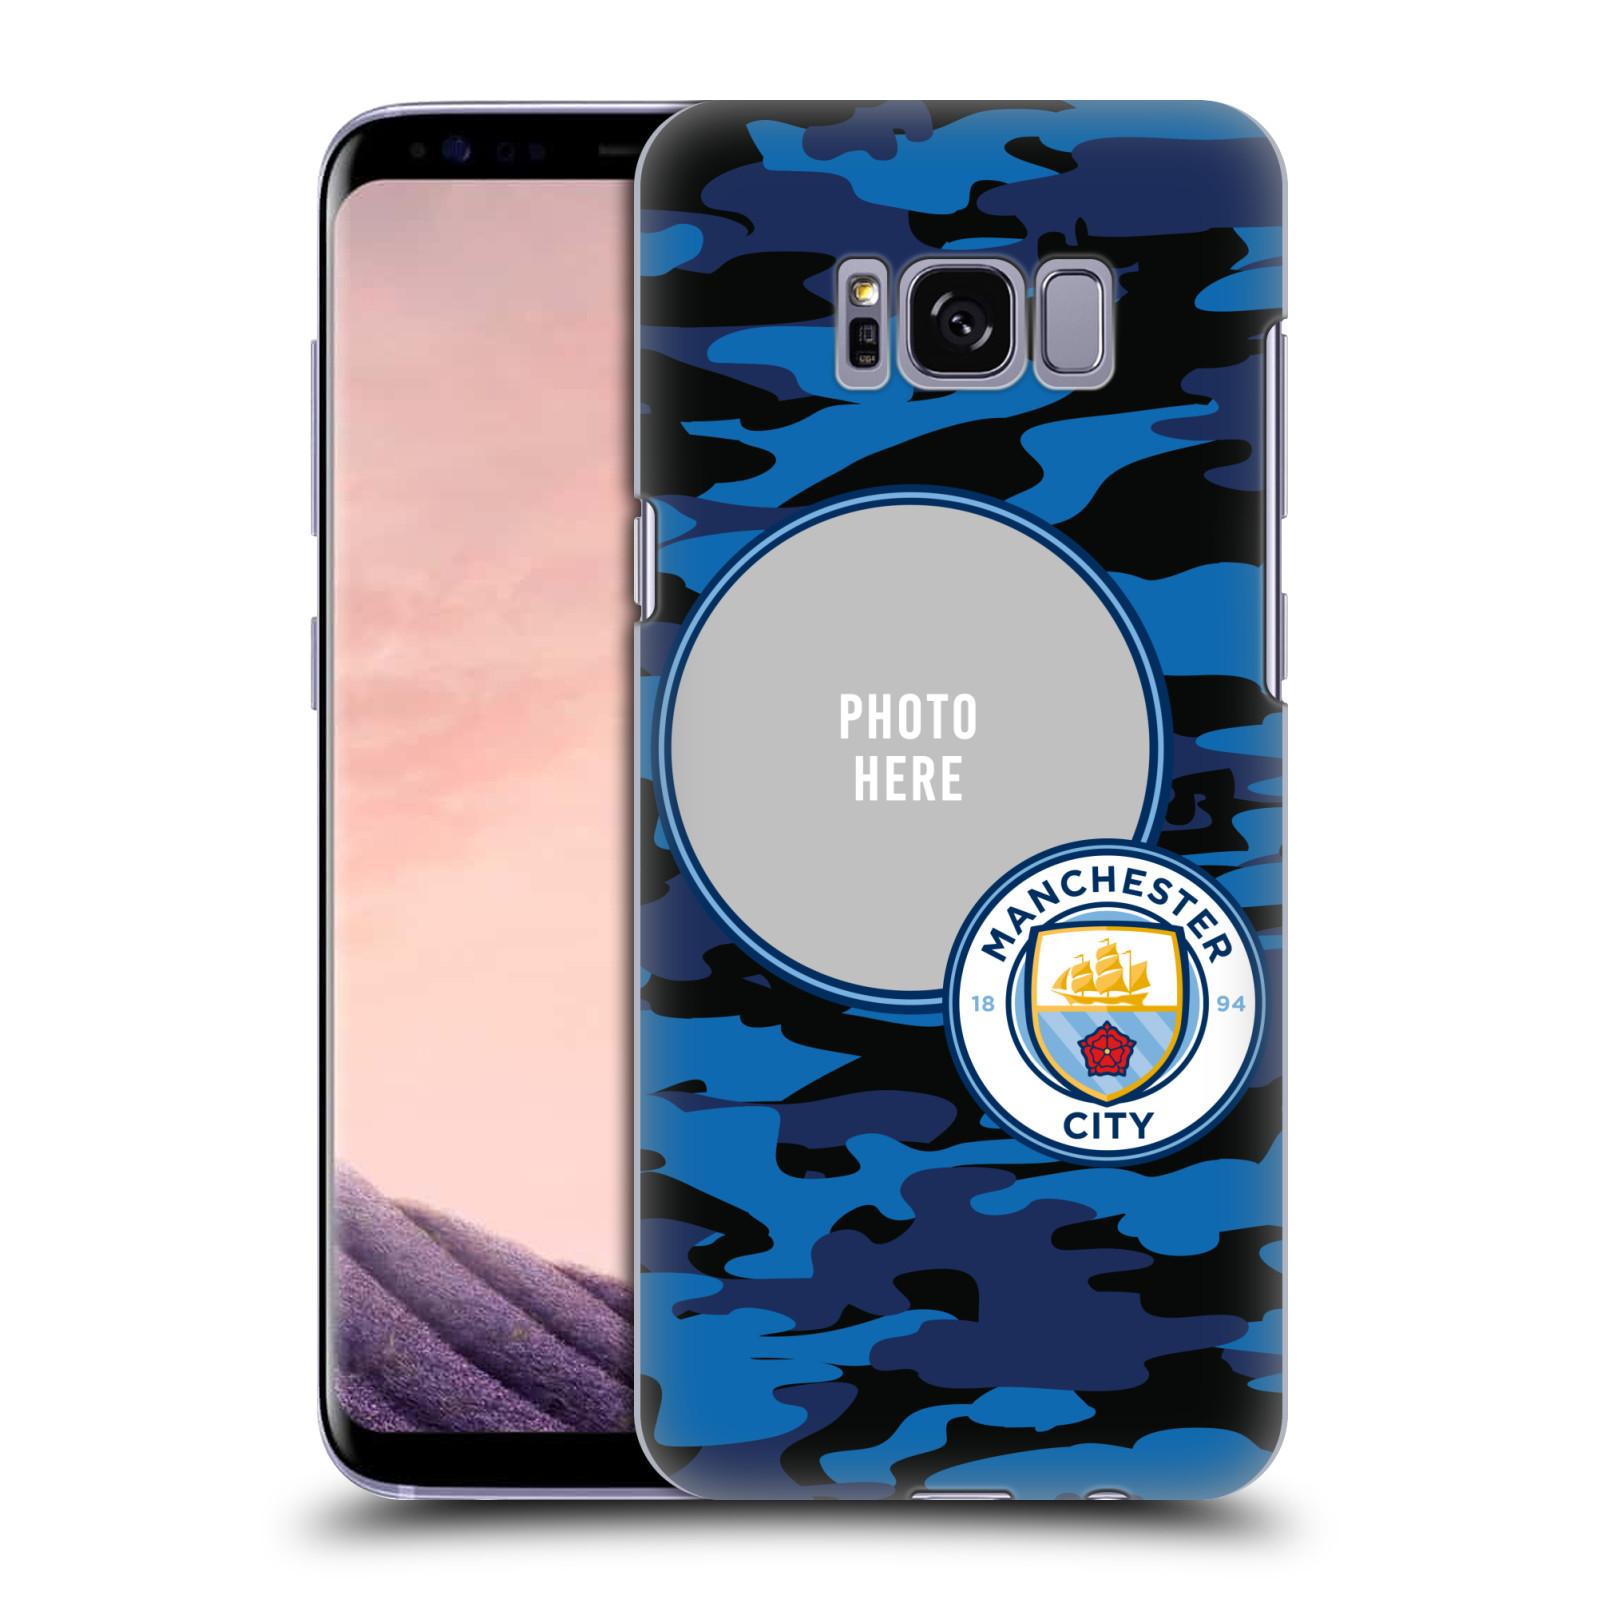 CUSTOM-MANCHESTER-CITY-MAN-CITY-FC-2017-18-LOGO-amp-KIT-CASE-FOR-SAMSUNG-PHONES-1